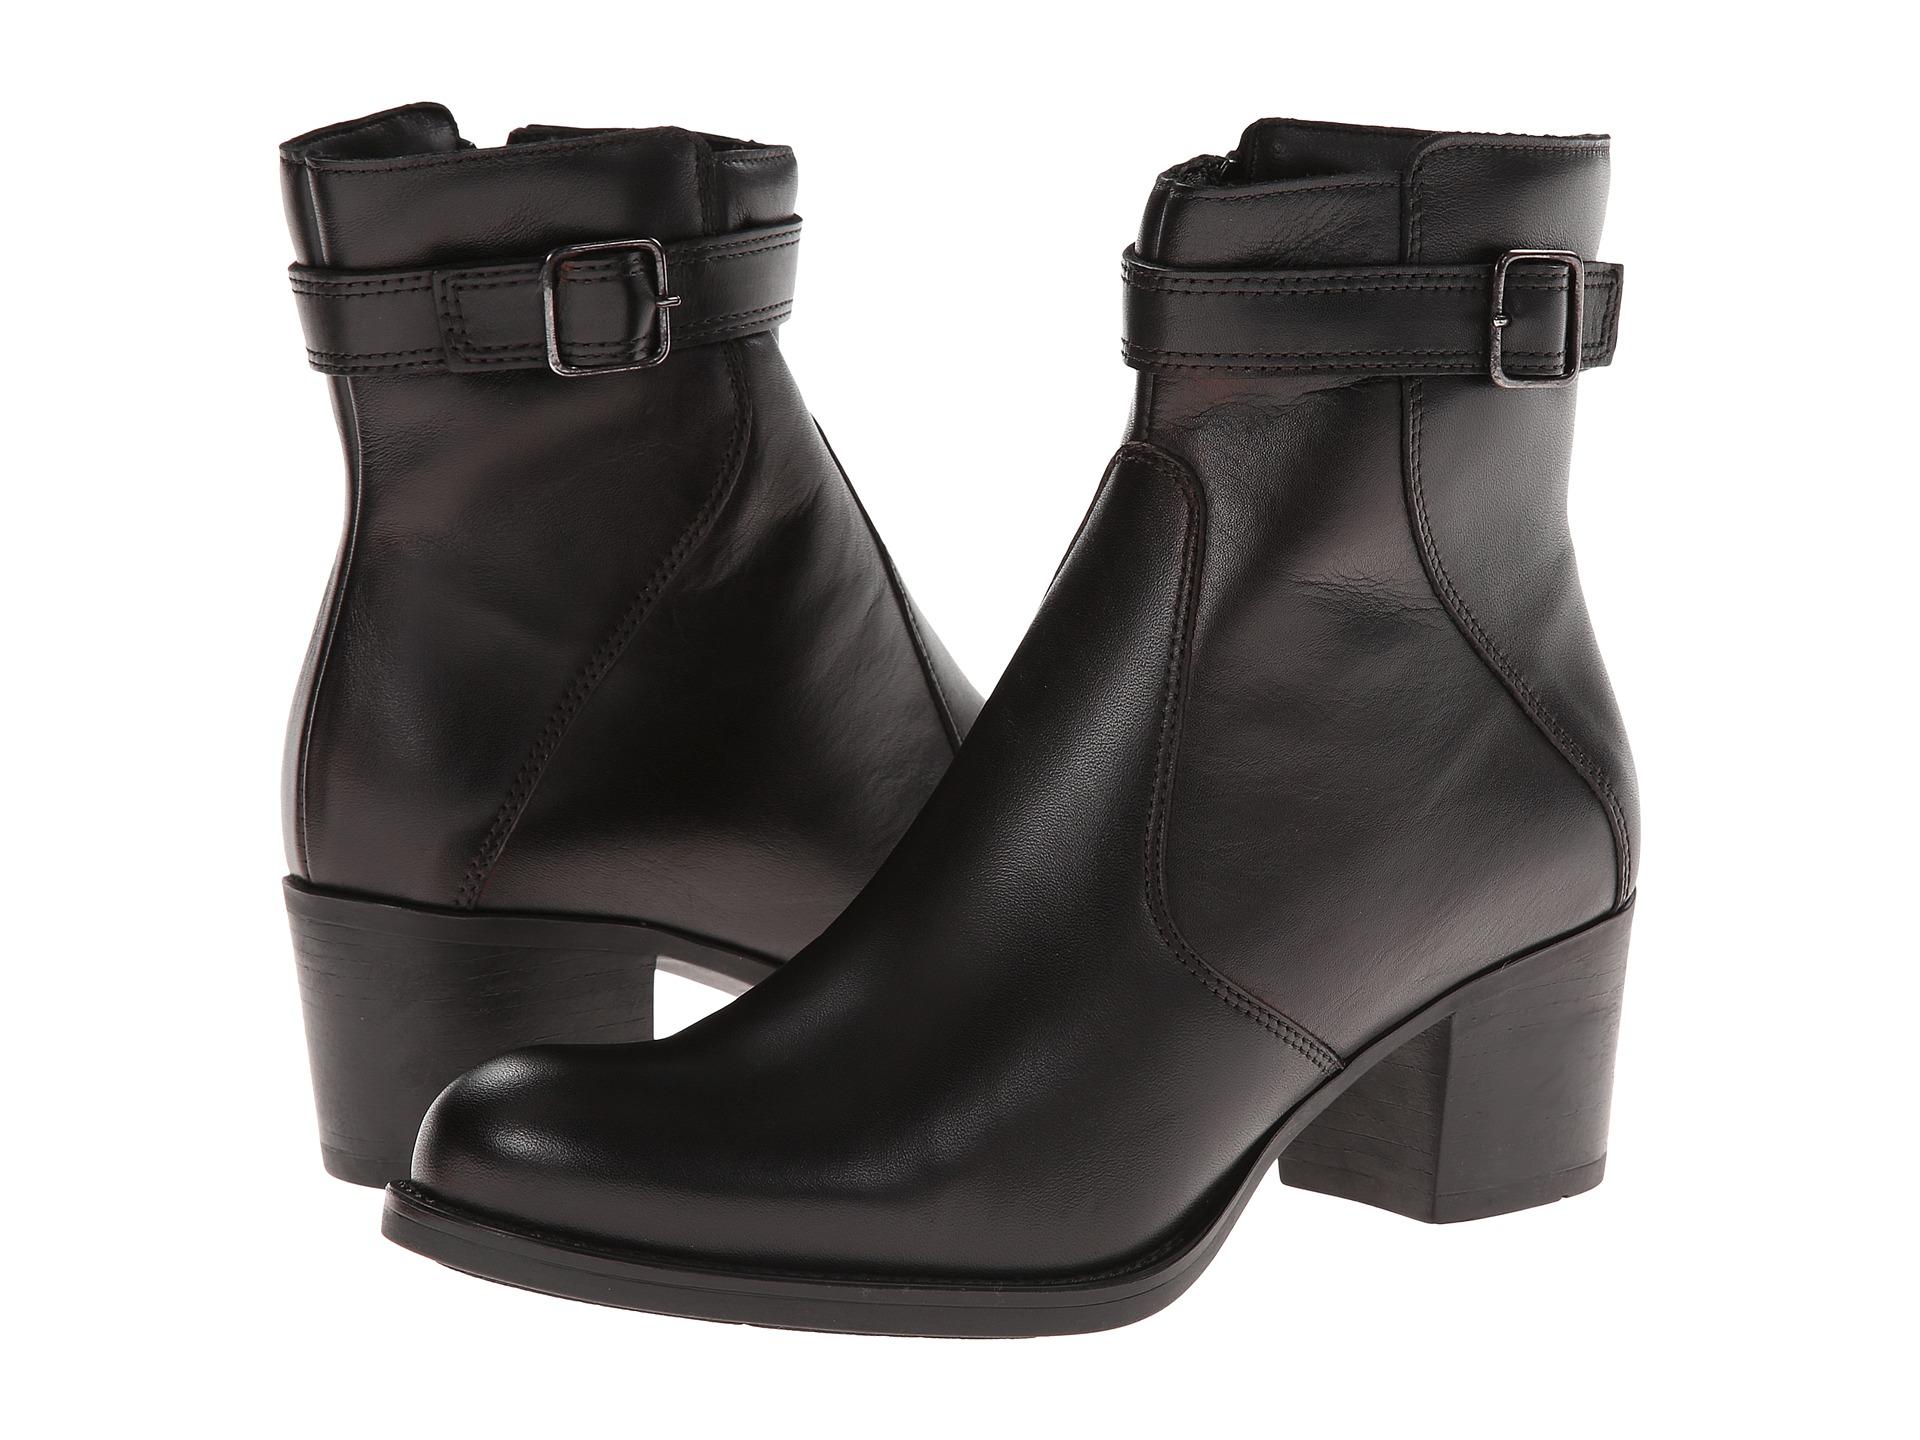 La Canadienne Pheonix Black Leather Zappos Com Free